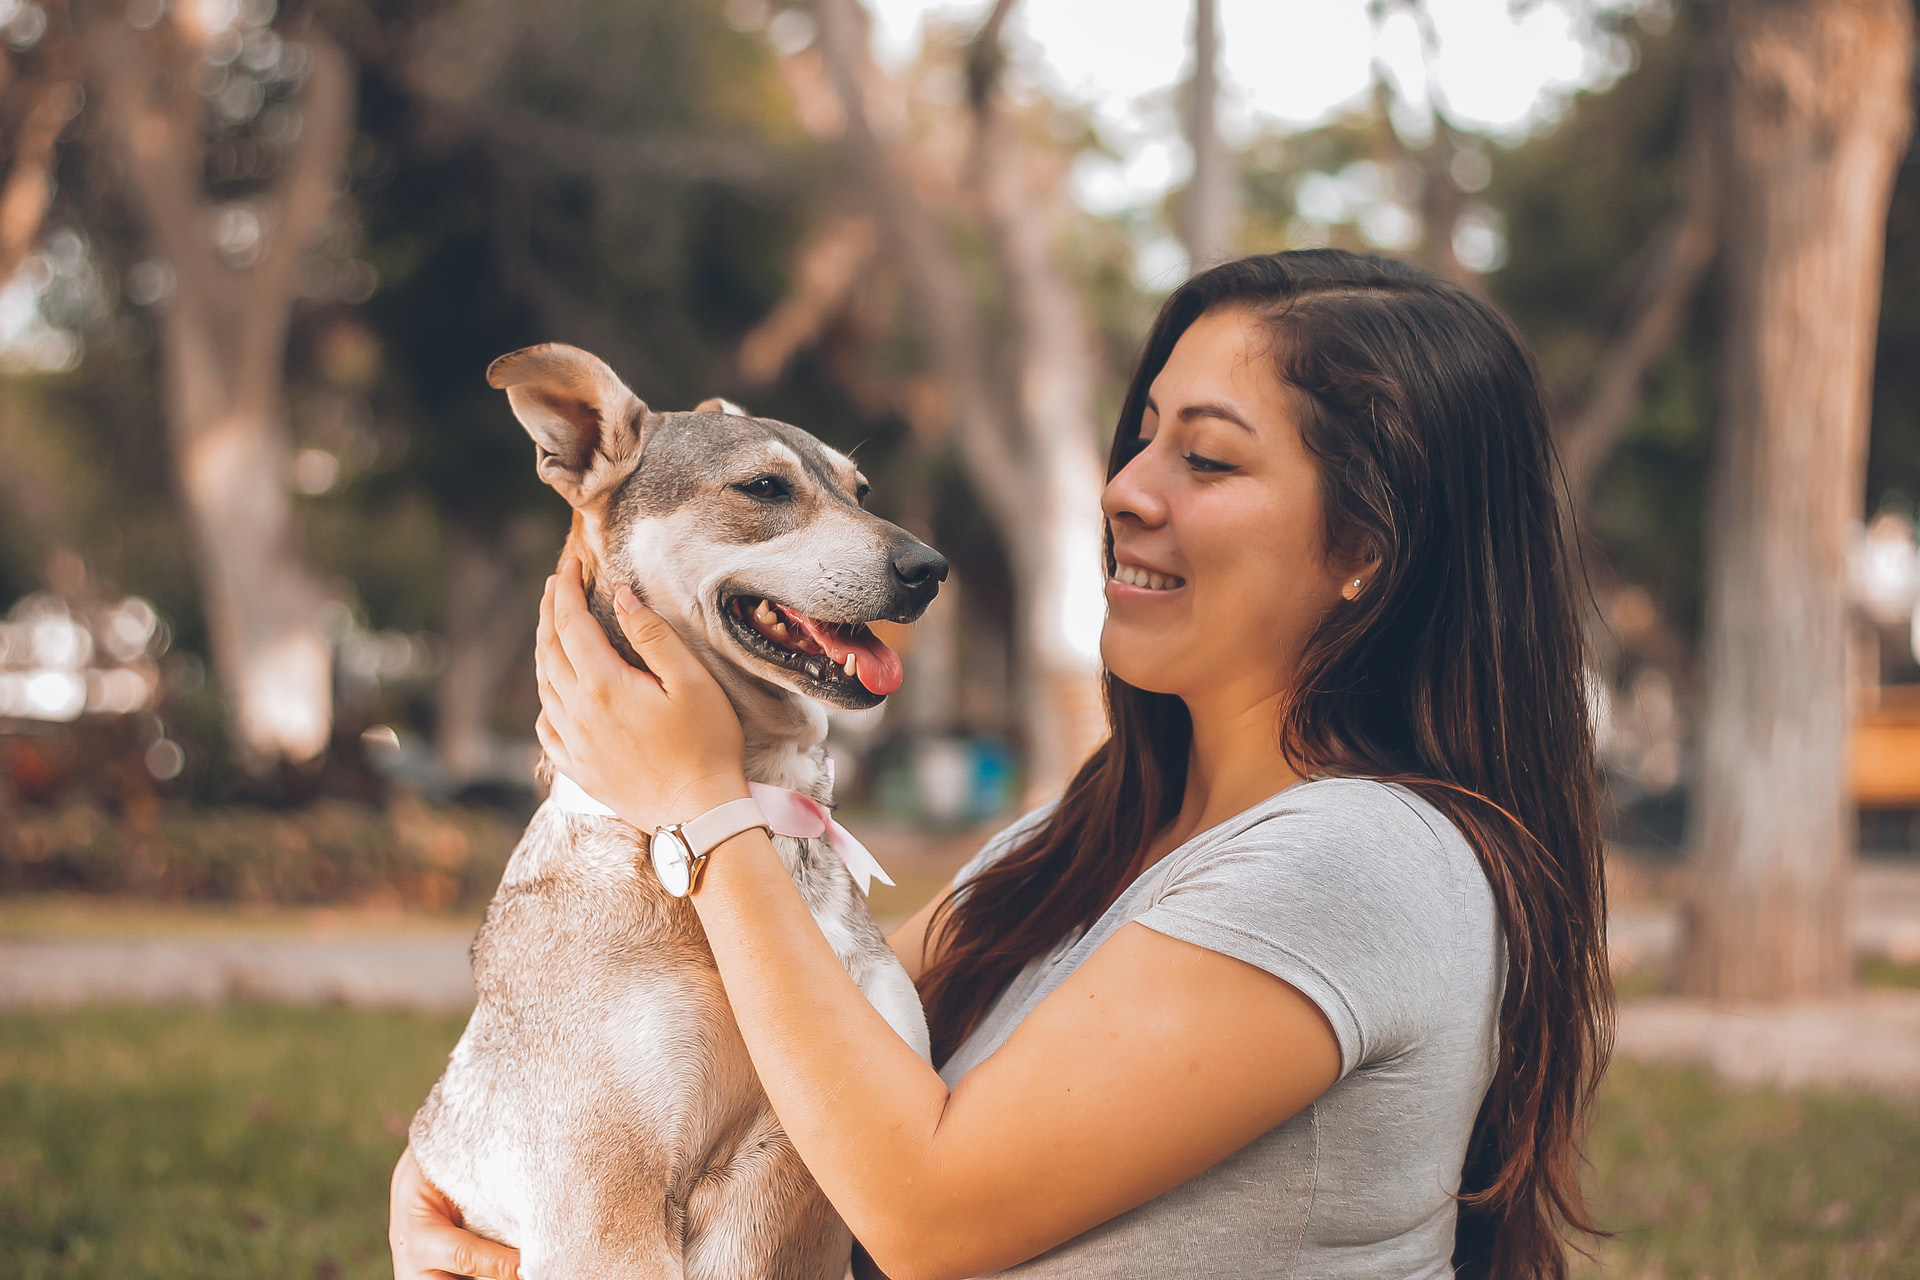 Dog Owners Live Longer, Healthier Lives